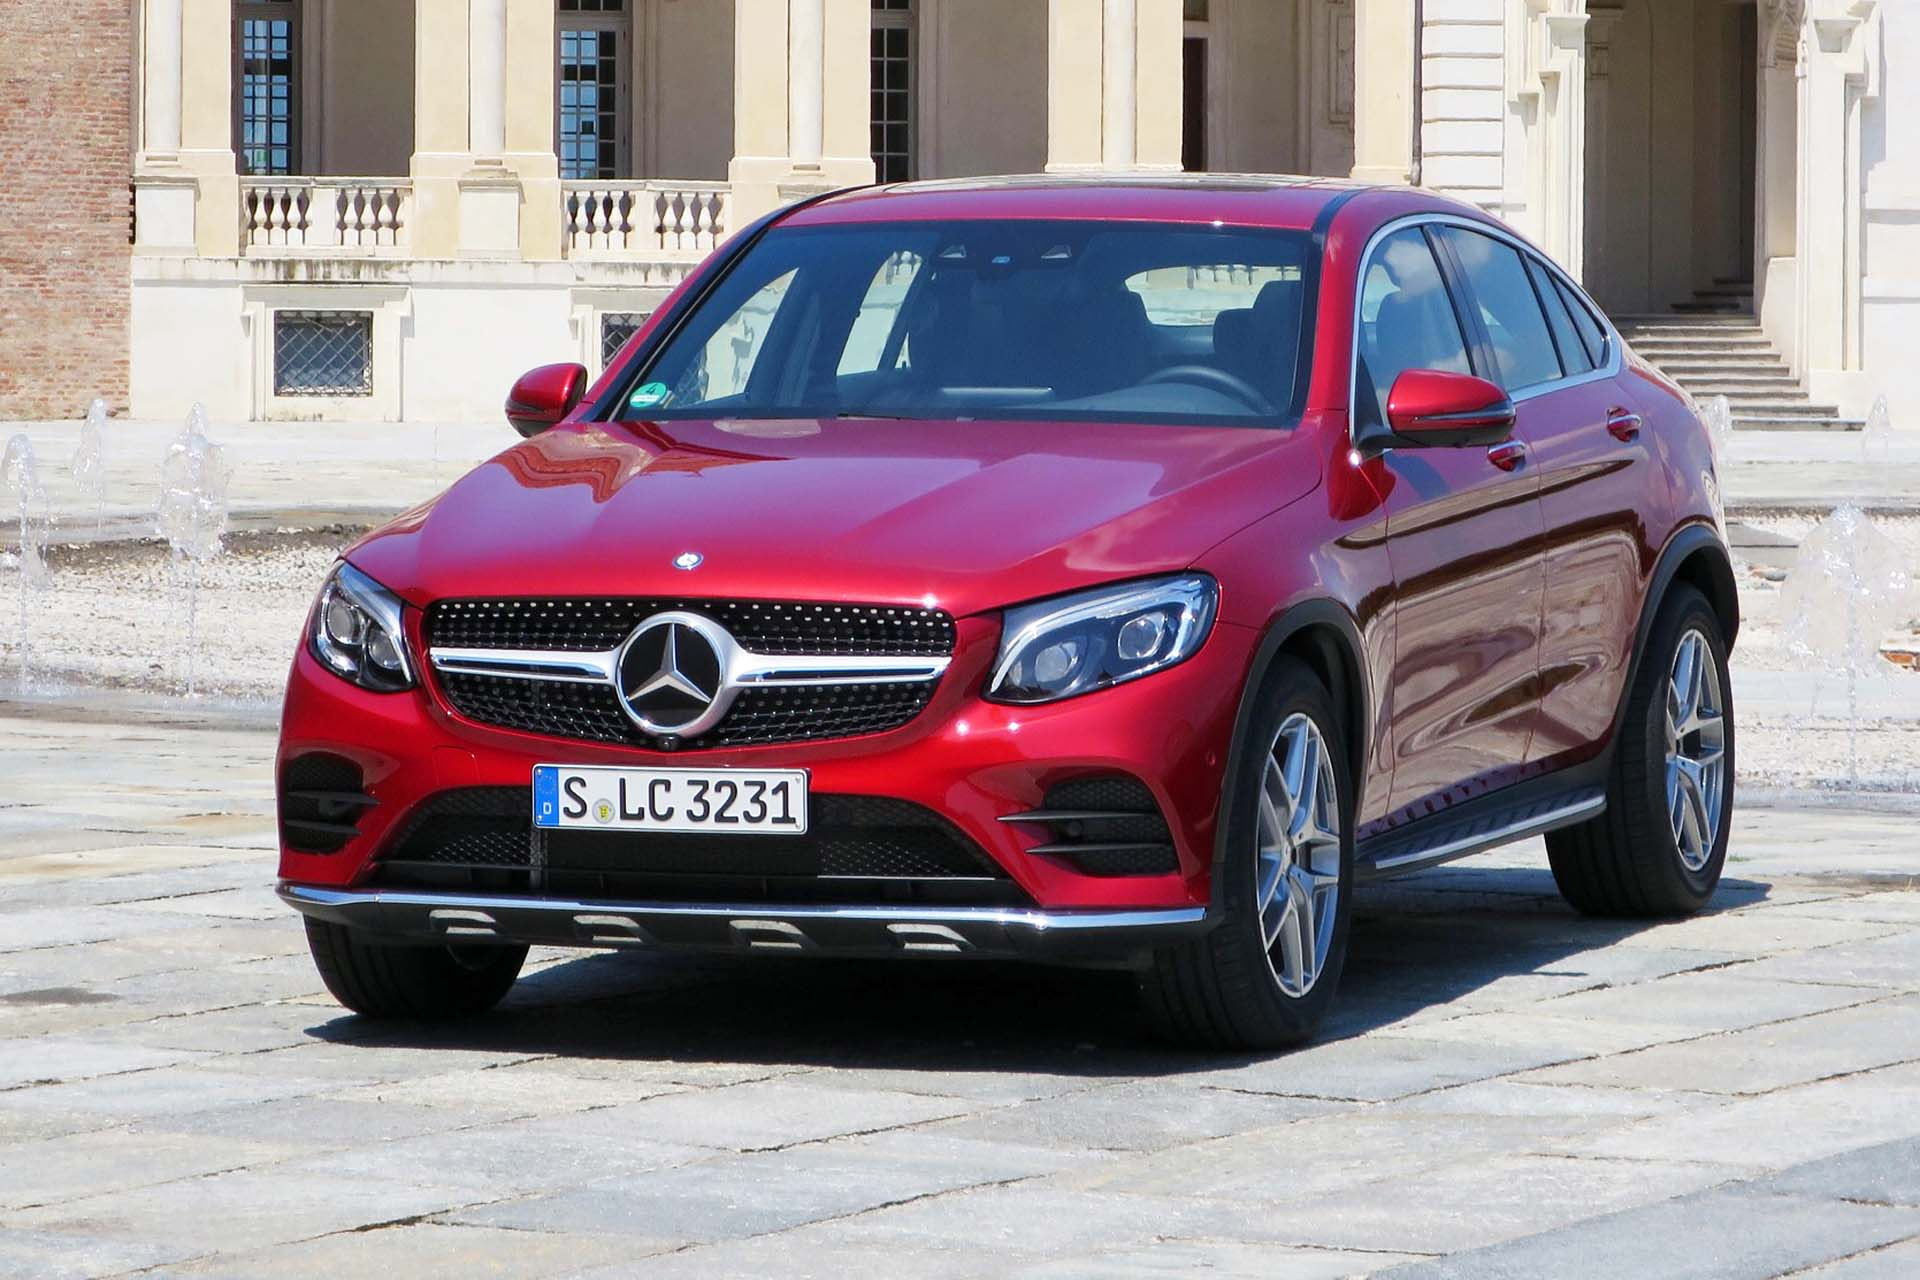 Mercedes 2017 4matic >> First Drive: 2017 Mercedes-Benz GLC 300 4MATIC Coupe - Autos.ca